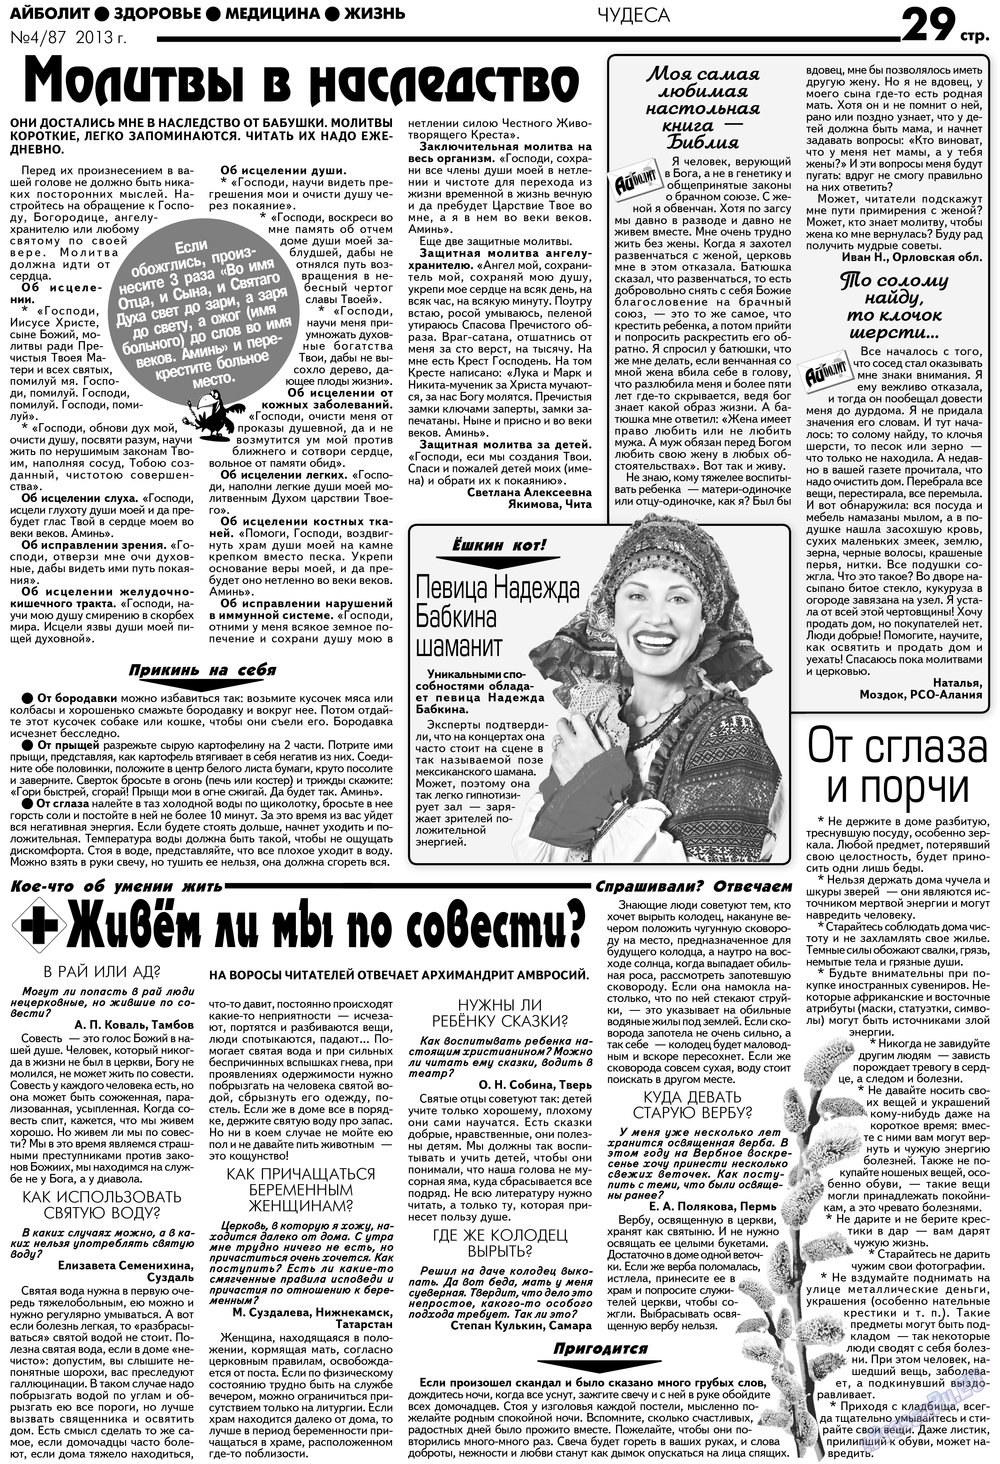 АйБолит (газета). 2013 год, номер 4, стр. 29